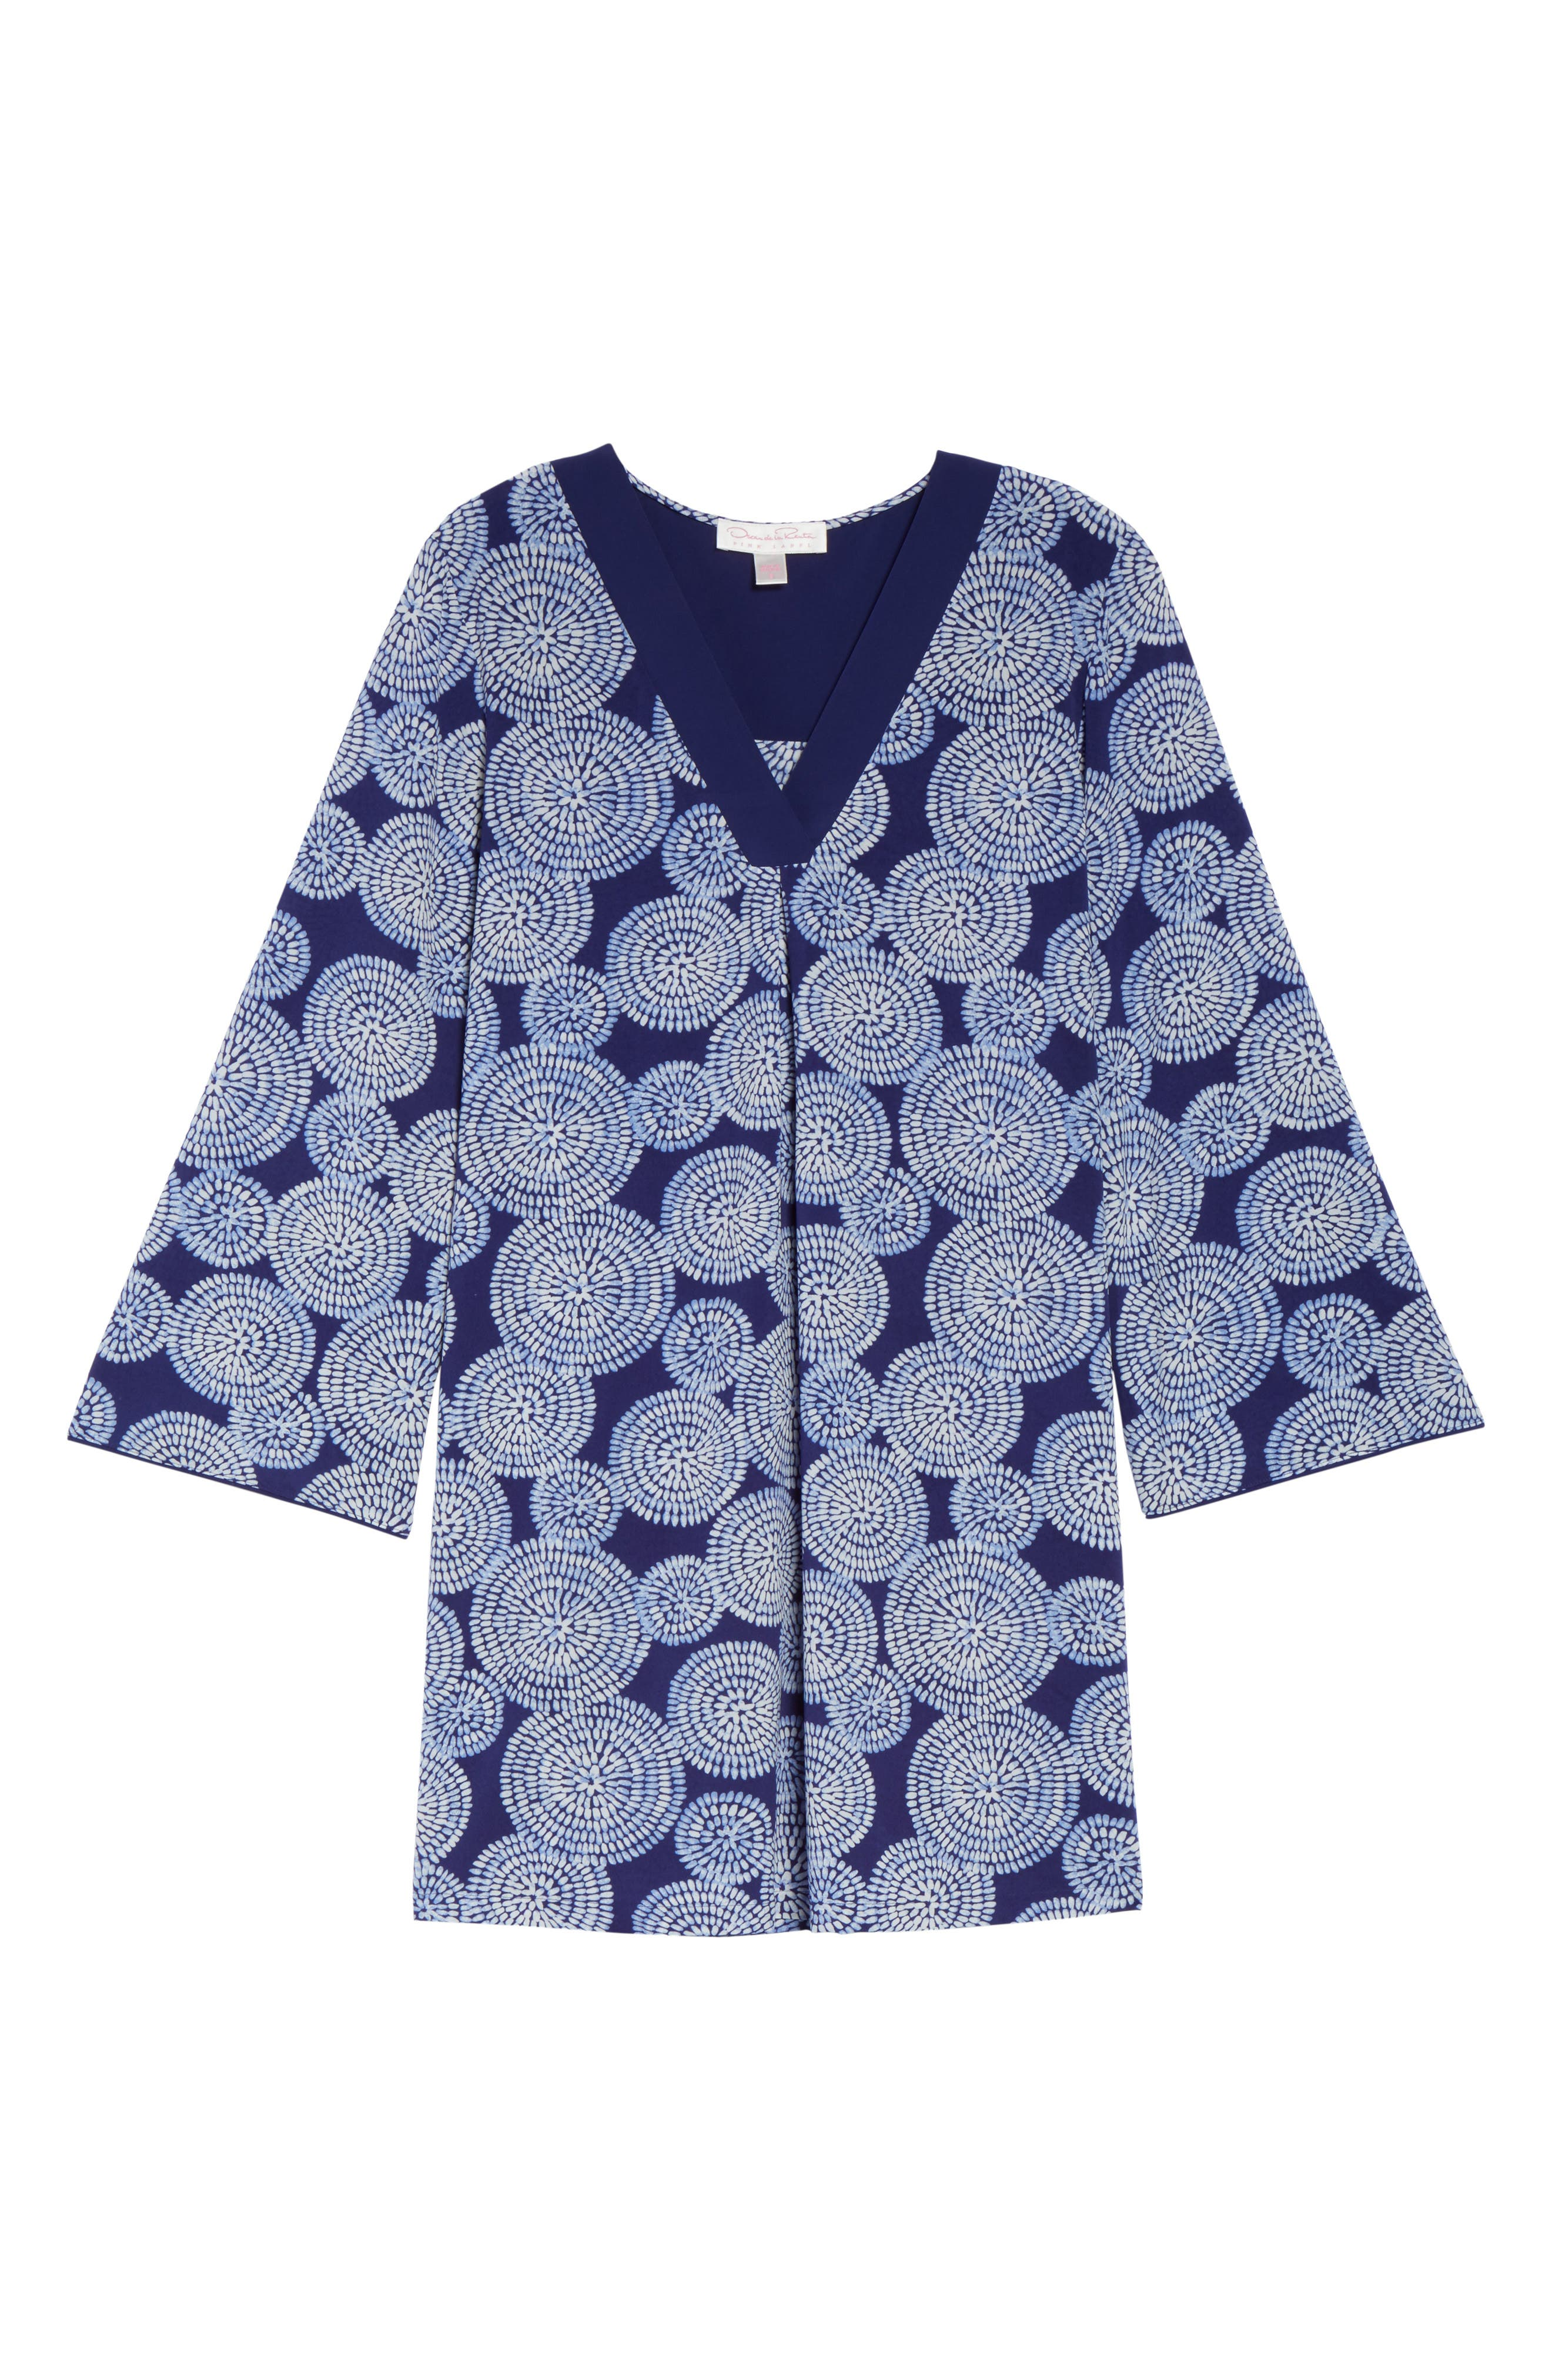 Sleepwear Halftan Short Nightgown,                             Alternate thumbnail 4, color,                             Eclipse Print